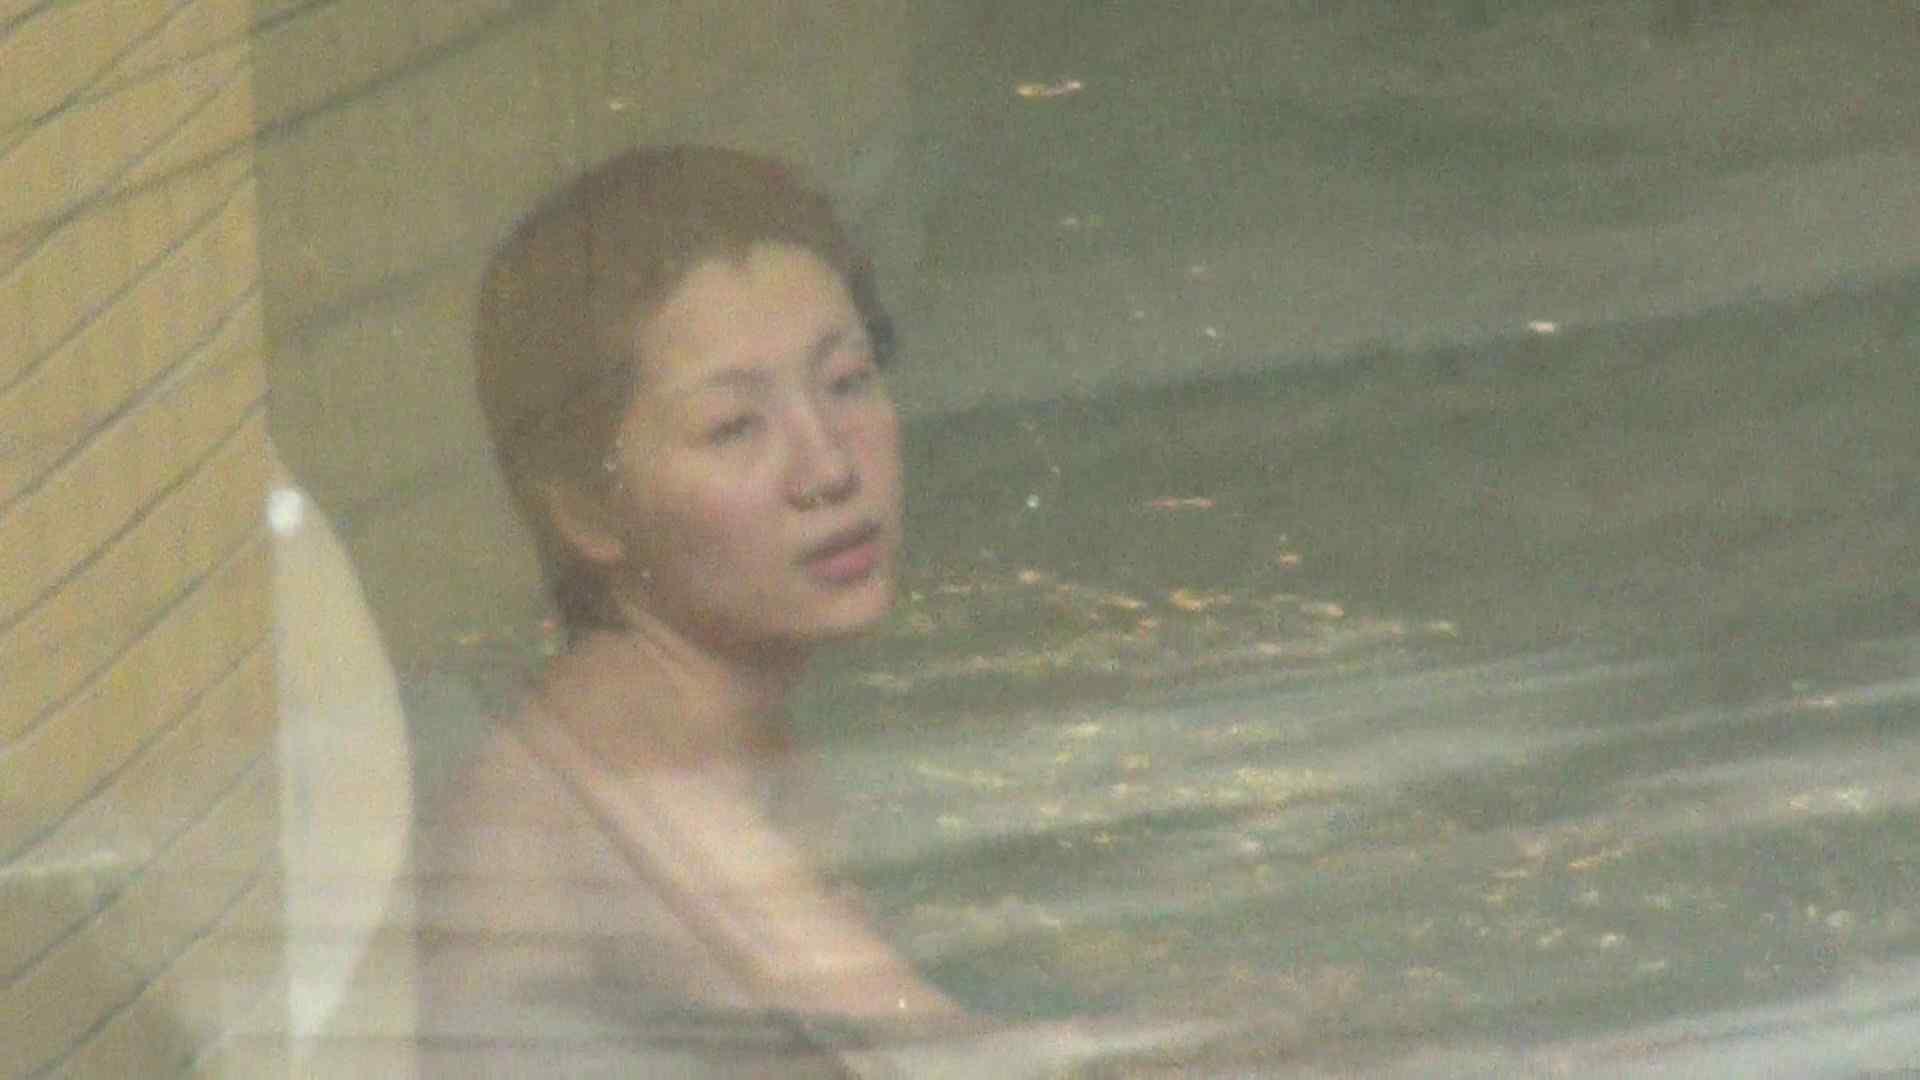 Aquaな露天風呂Vol.241 0  50連発 8